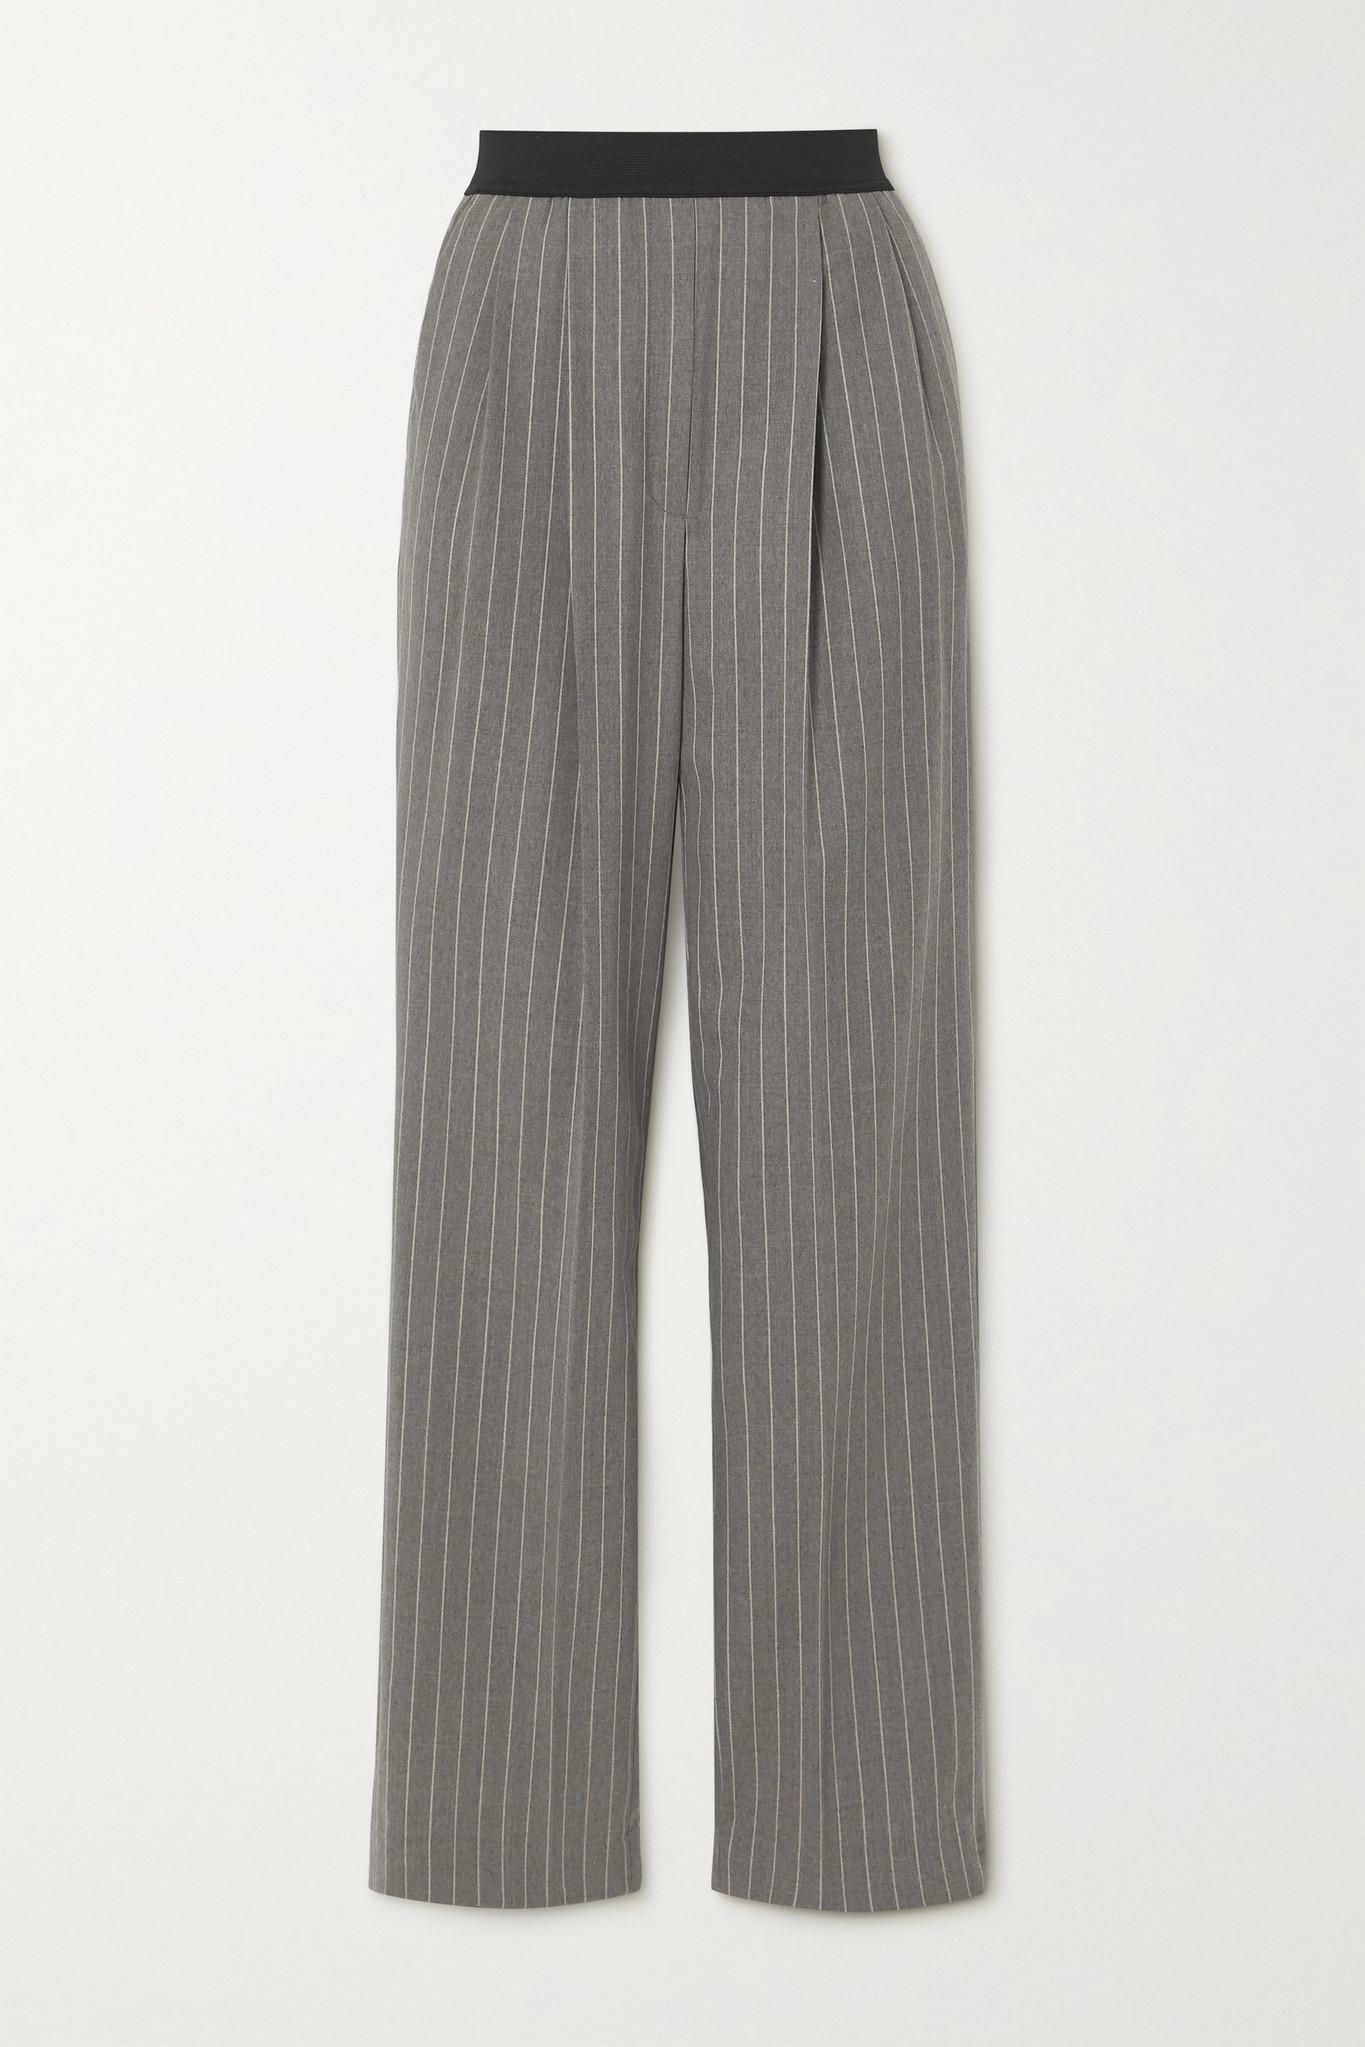 LOULOU STUDIO - Moretta 褶裥细条纹弹力羊毛直筒裤 - 灰色 - large